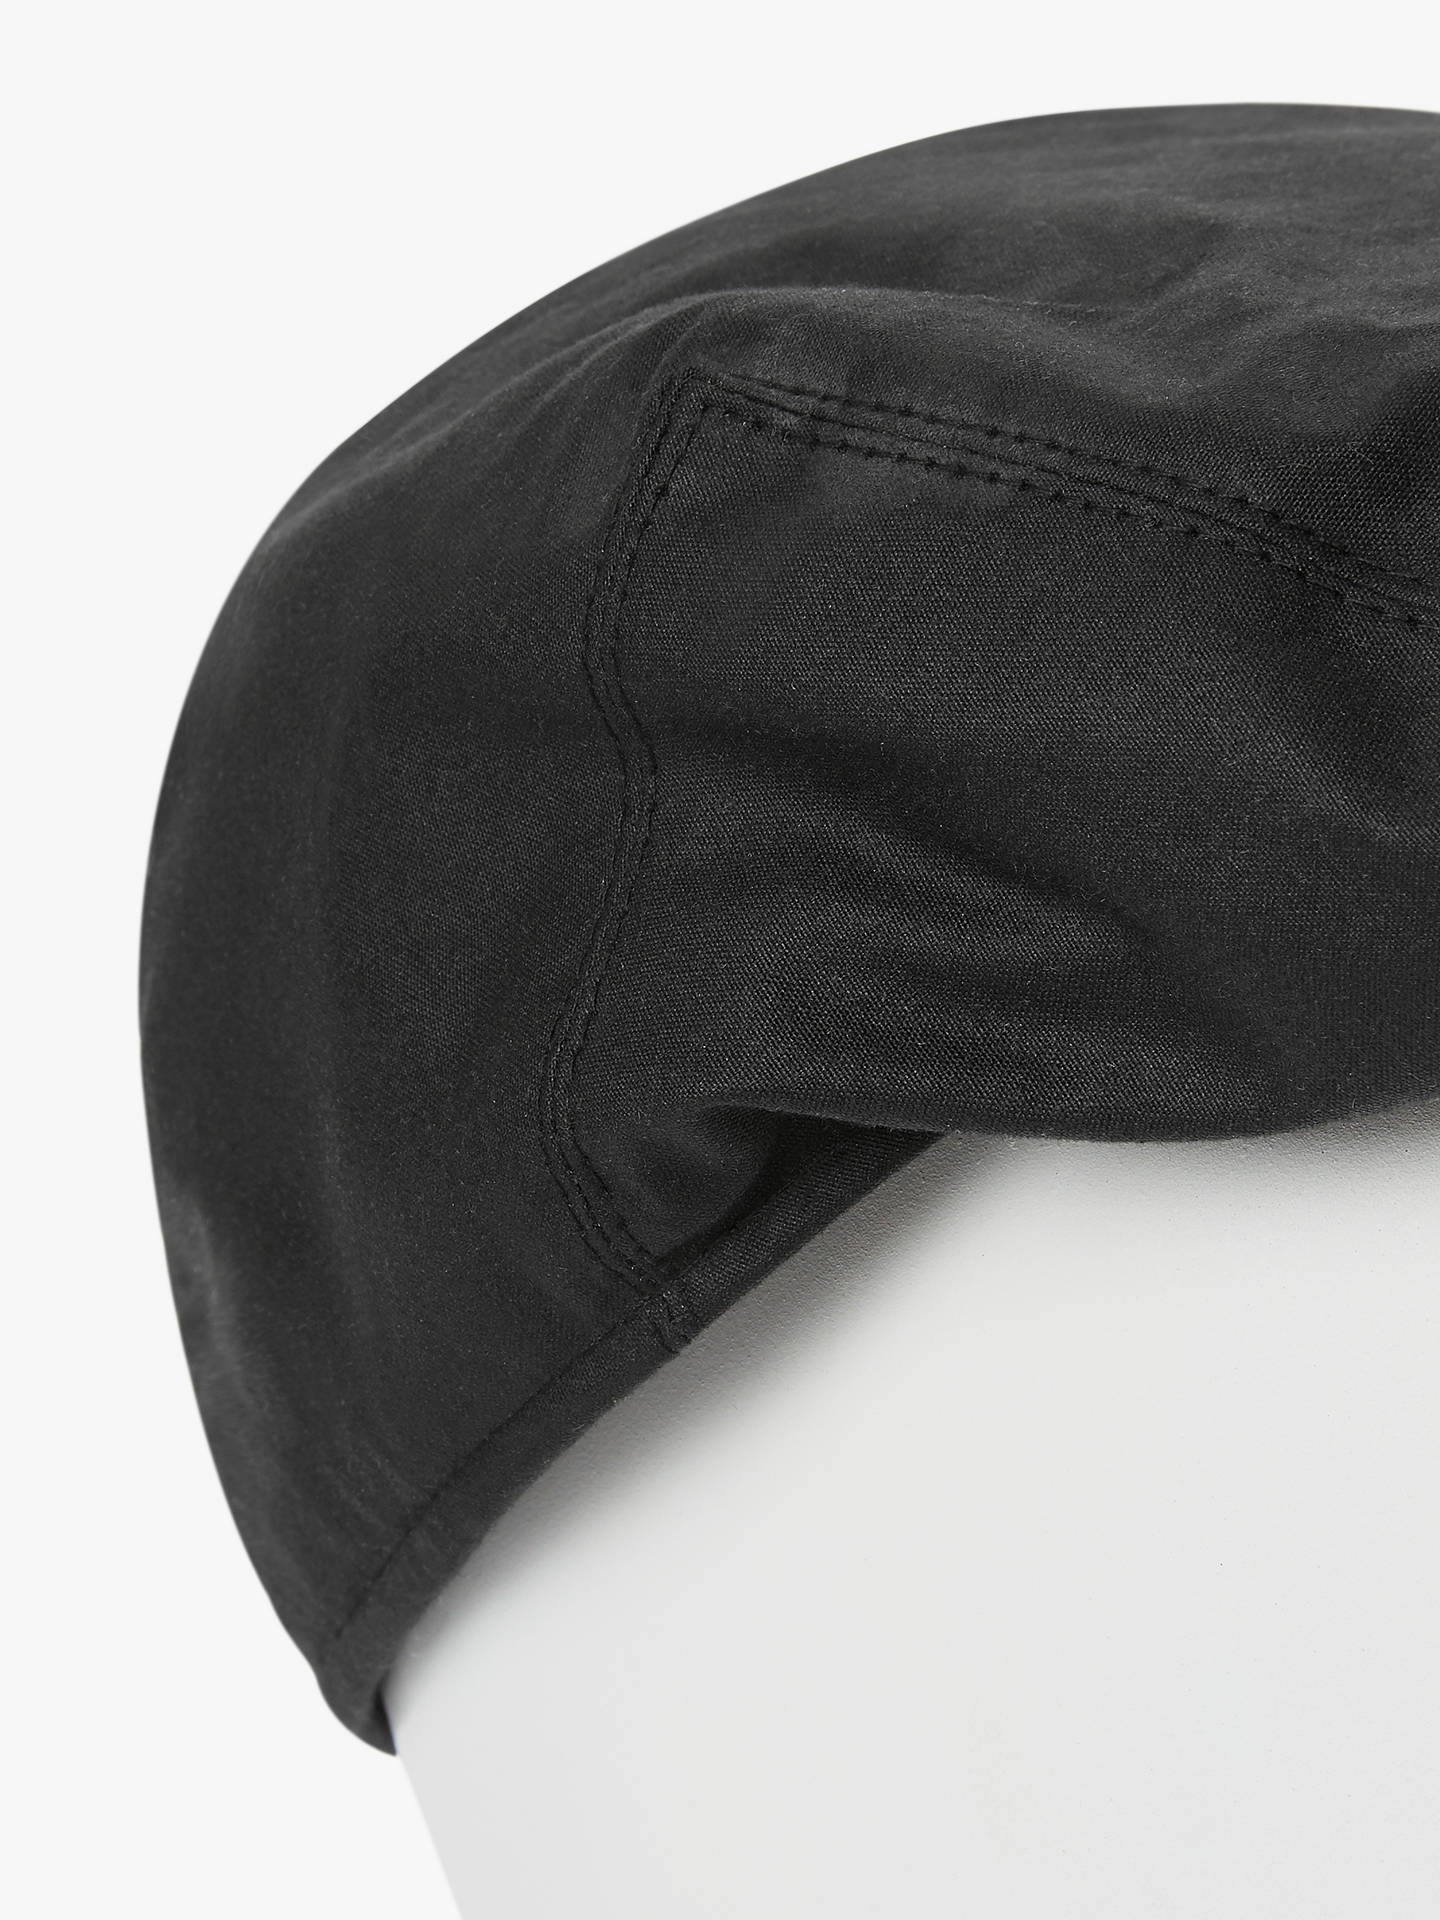 7b24a0225e8 ... BuyJohn Lewis   Partners Waxed Cotton Flat Cap